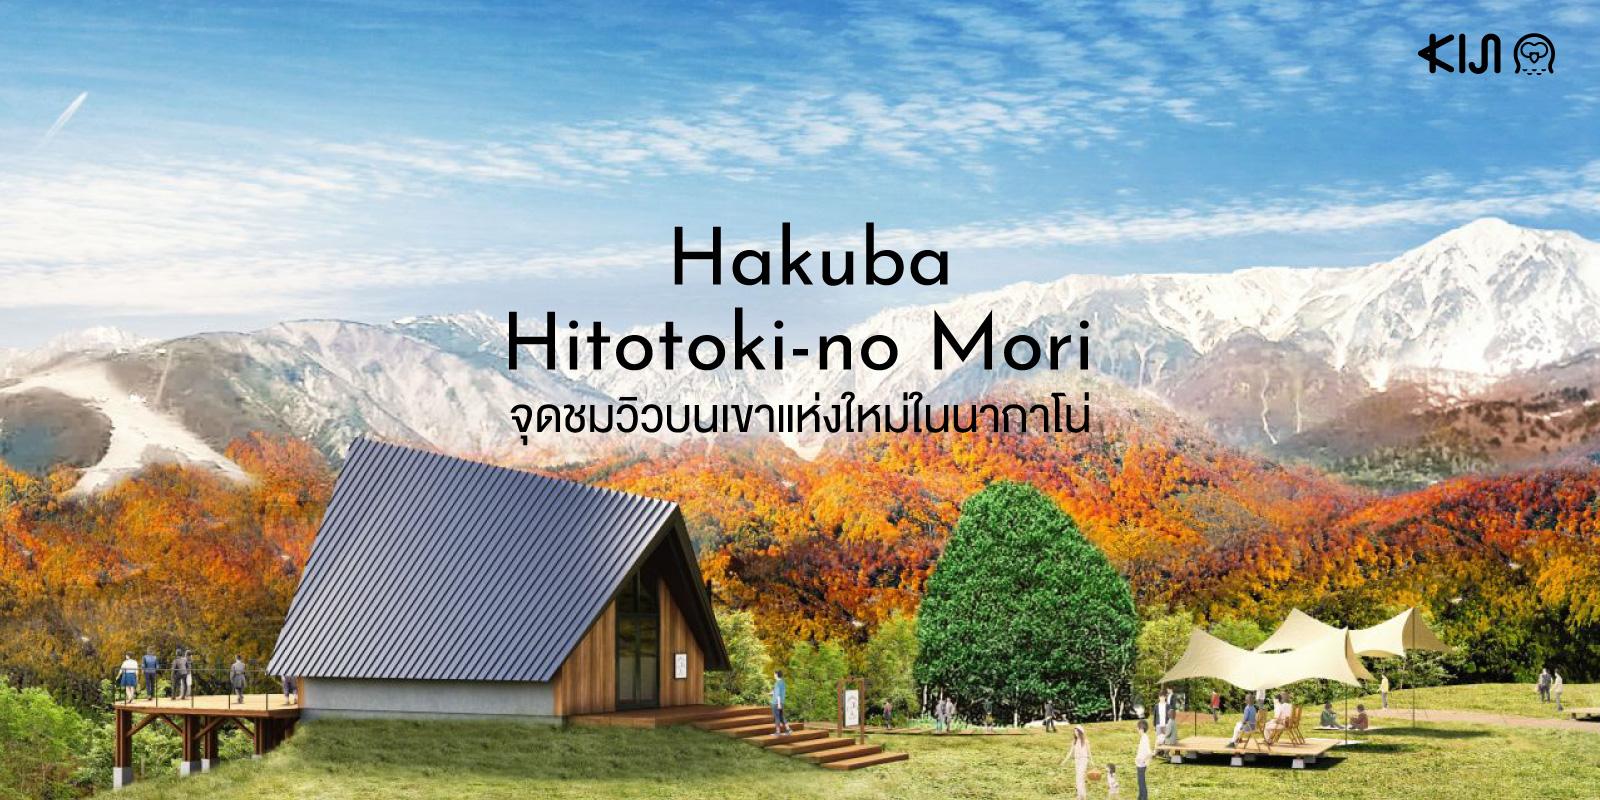 Hakuba Hitotoki no Mori จุดชมวิวบนภูเขาอิวาทาเกะ (Mt. Iwatake)